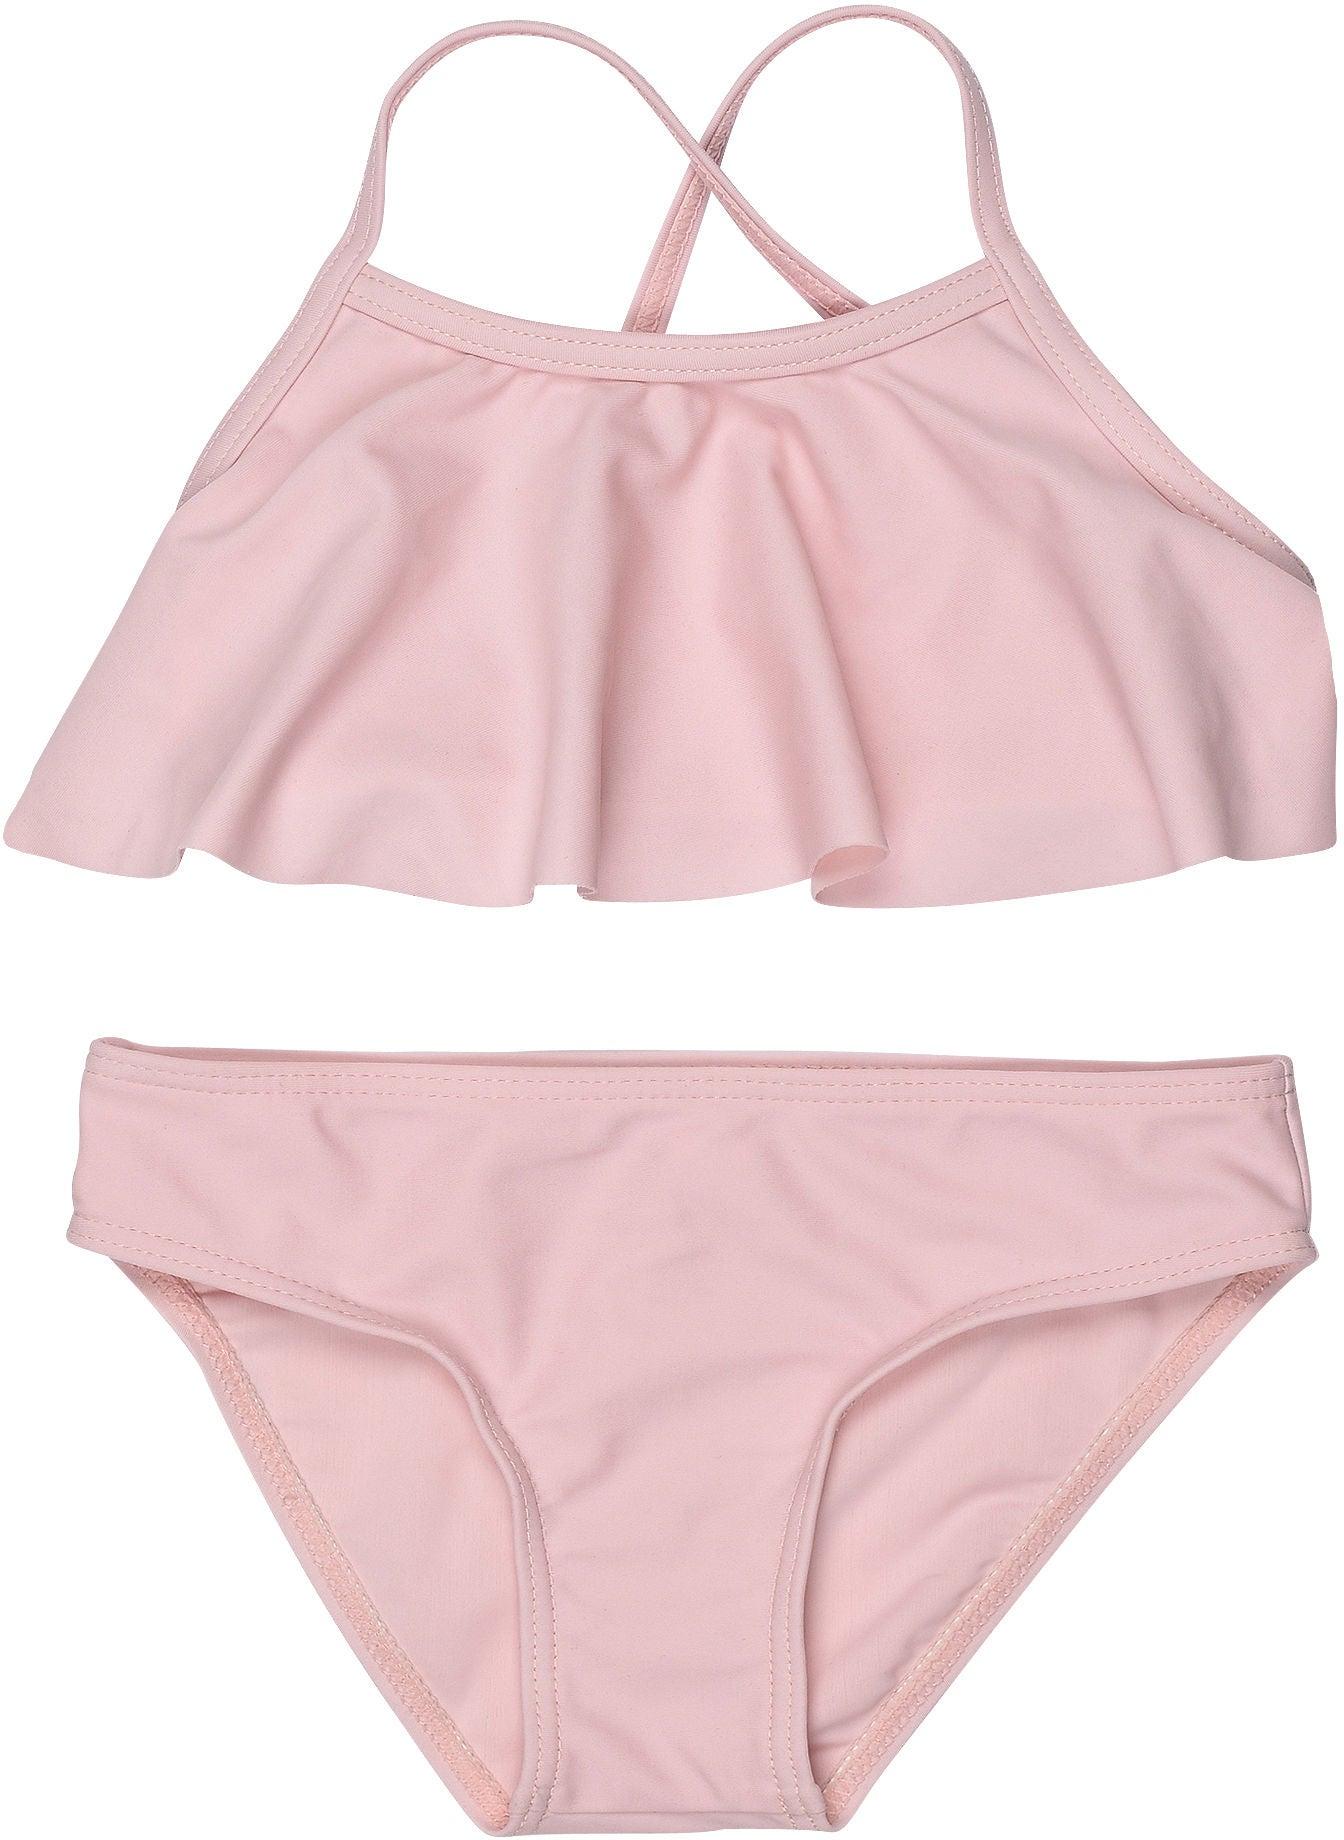 Lindberg Lucinda Bikini, Pink, 110/116